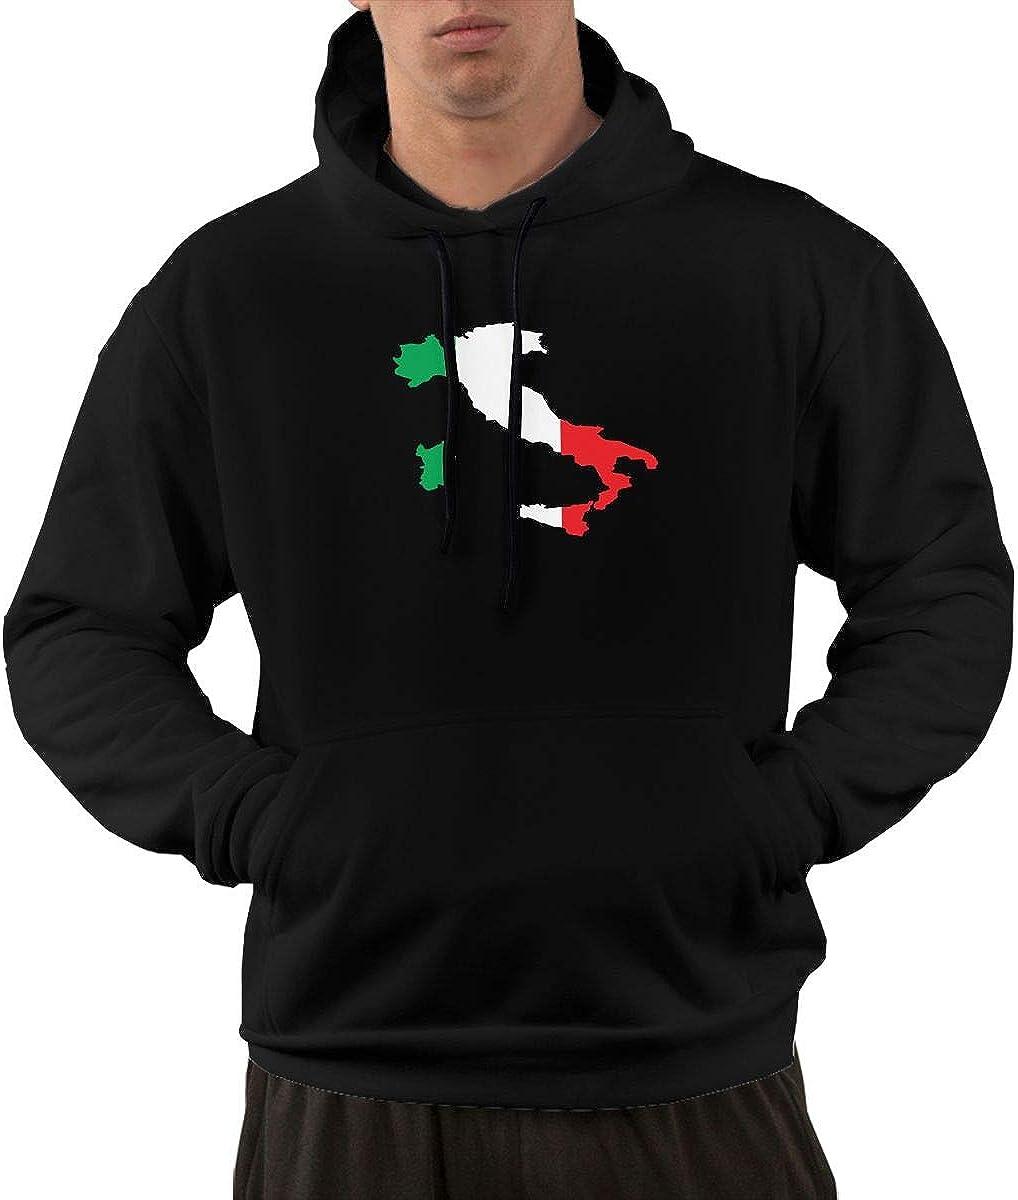 Iponvx Italian Green White Red Flag Map Hoodie Mens Performance Active Full Zip Sweatshirts